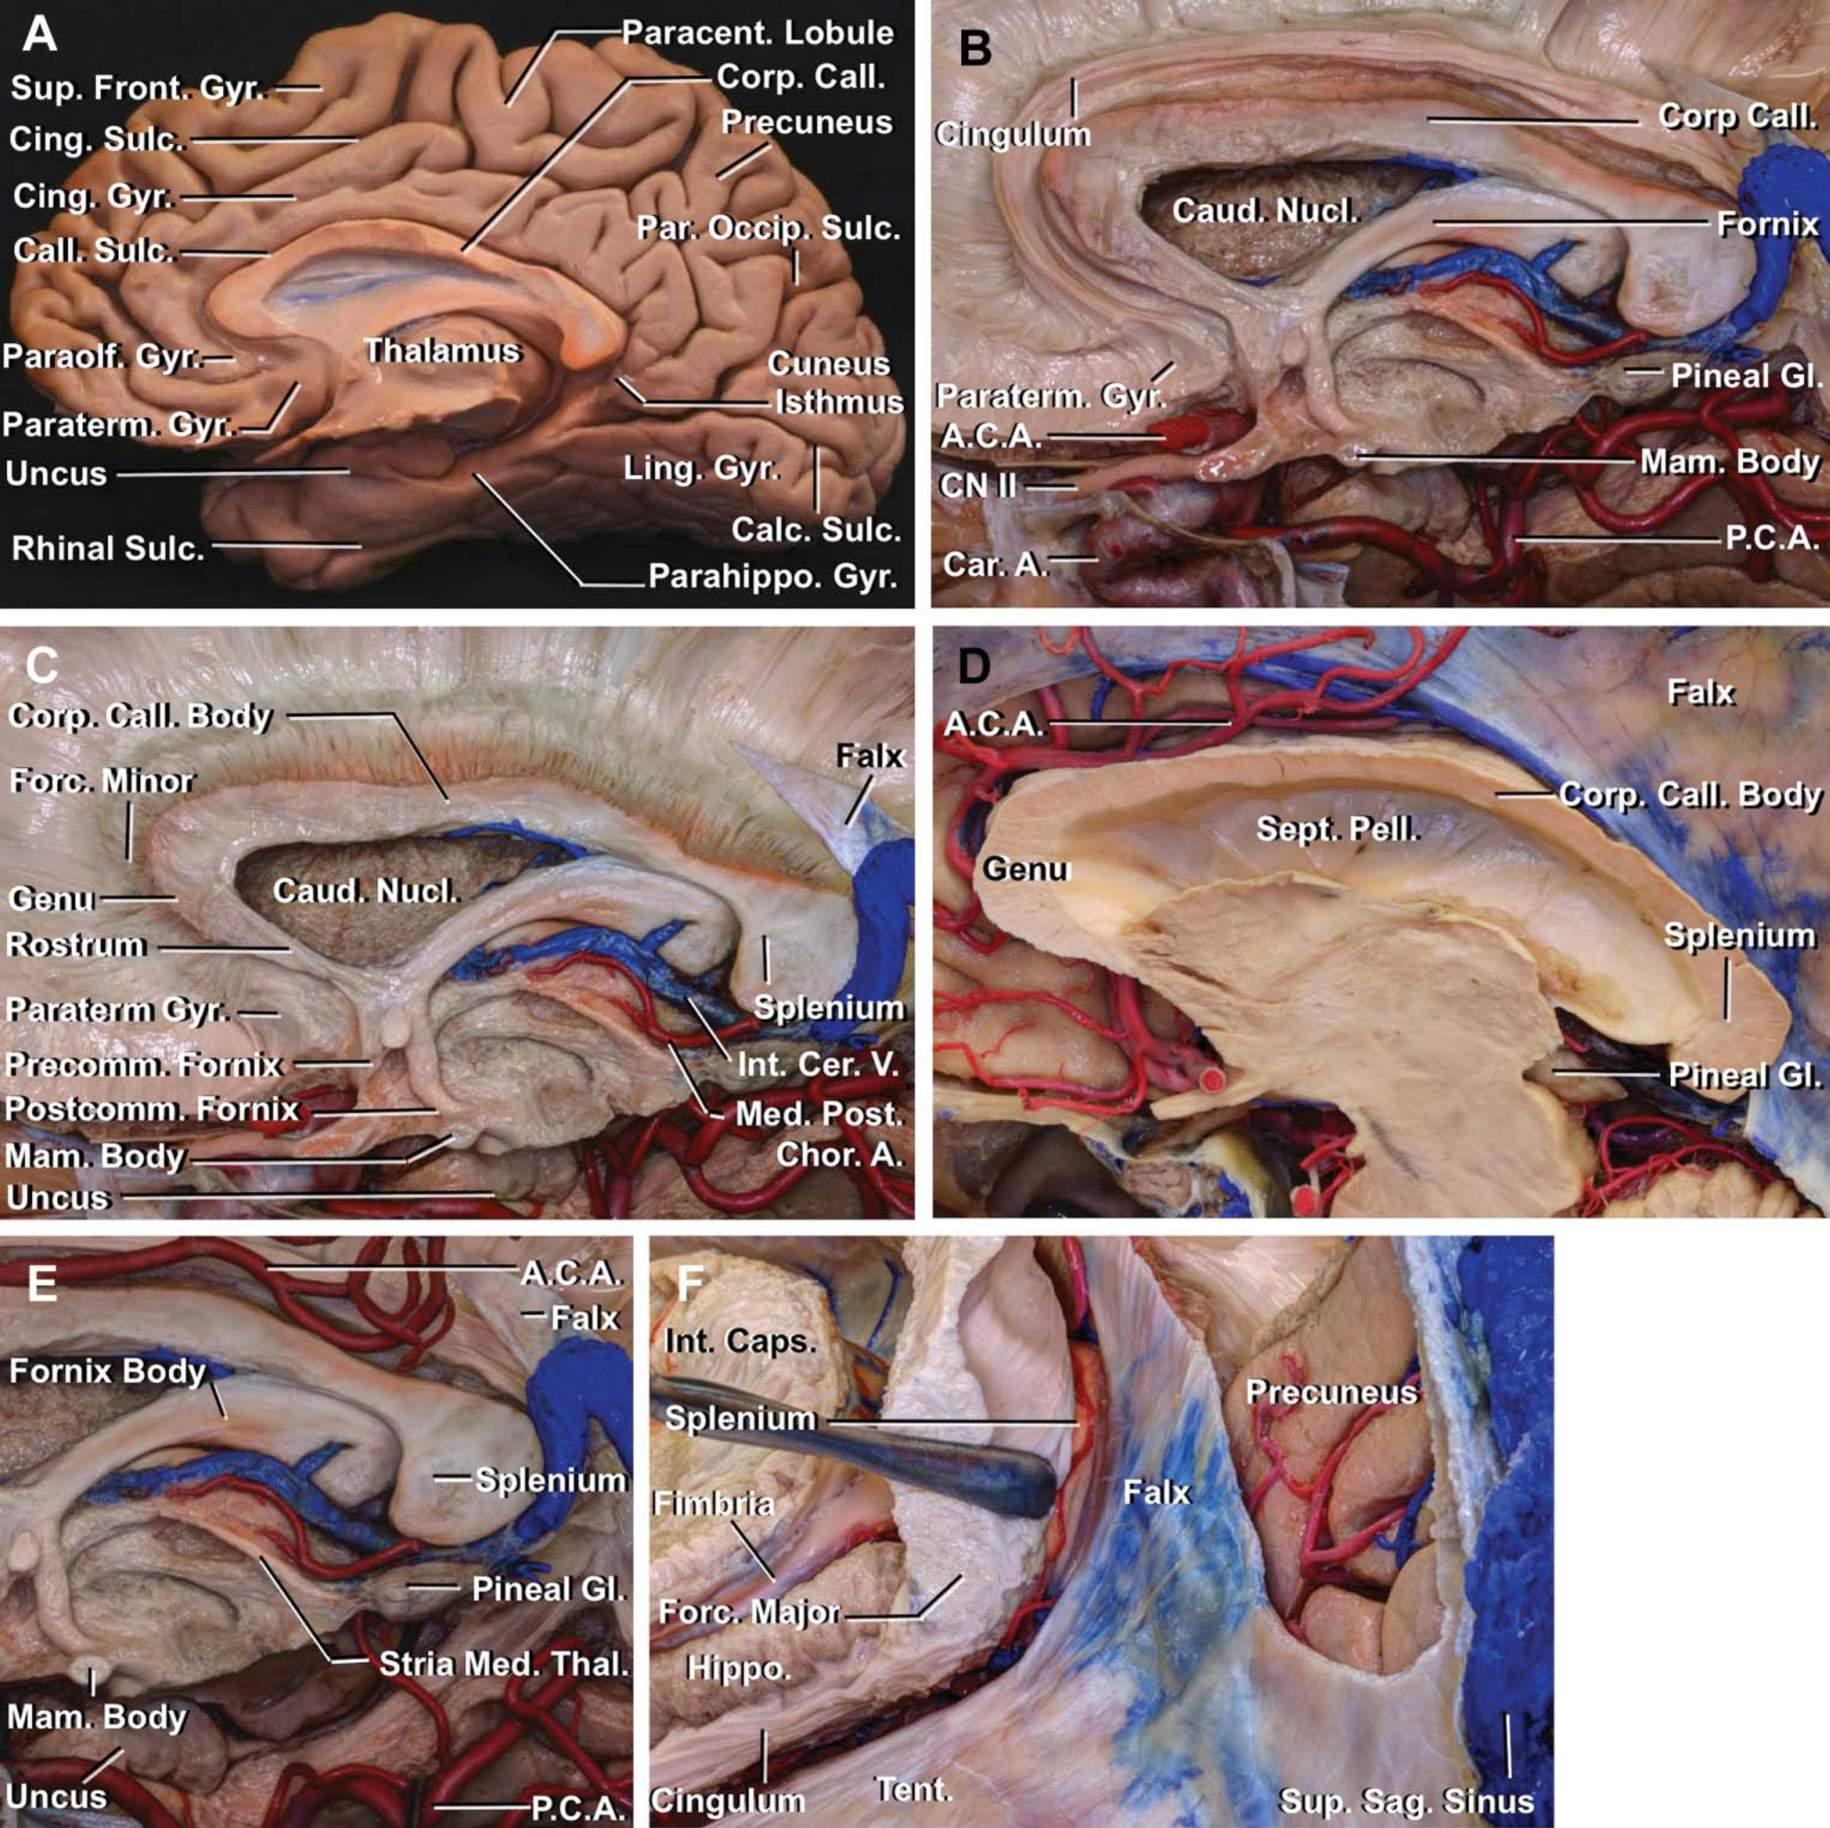 Figure 1: A transected corpus callosum and the adjacent cerebrovasculature. The segments of the corpus callosum are annotated. A. C. A., anterior cerebral artery; Calc. Sulc., calcarine sulcus; Call. Sulc., callosal sulcus; Car. A., carotid artery; Caud. Nucl., caudate nucleus; Chor. A., choroidal artery; Cing. Gyr., cingulate gyrus; Cing. Sulc., cingulate sulcus; CN, cranial nerve; Corp. Call., corpus callosum; Forc. Major., forcepsmajor; Forc. Minor, forceps minor; Hippo., hippocampus; Int. Caps., internal capsule; Int. Cer. V., internal cerebral vein; Ling. Gyr., lingual gyrus; Mam. Body, mammillary body; Med. Post., medial posterior; Rhinal Sulc., rhinal sulcus; Par. Occip. Sulc., parieto-occipital sulcus; Paracent. Lobule, paracentral lobule; Paraolf. Gyr., parolfactory gyrus; Paraterm. Gyr., paraterminal gyrus; Parahippo. Gyr., parahippocampal gyrus; P. C. A., posterior cerebral artery; Pineal Gl., pineal gland; Precomm. Fornix, precommissural fornix; Postcomm. Fornix., postcommissural fornix; Sept. Pell., septum pellucidum; Stria Med. Thal., stria medullaris of thalamus; Sup. Front. Gyr, superior frontal gyrus; Sup. Sag. Sinus, superior sagittal sinus; Tent., tentorium. (Photos courtesy of AL Rhoton, Jr. 14 )